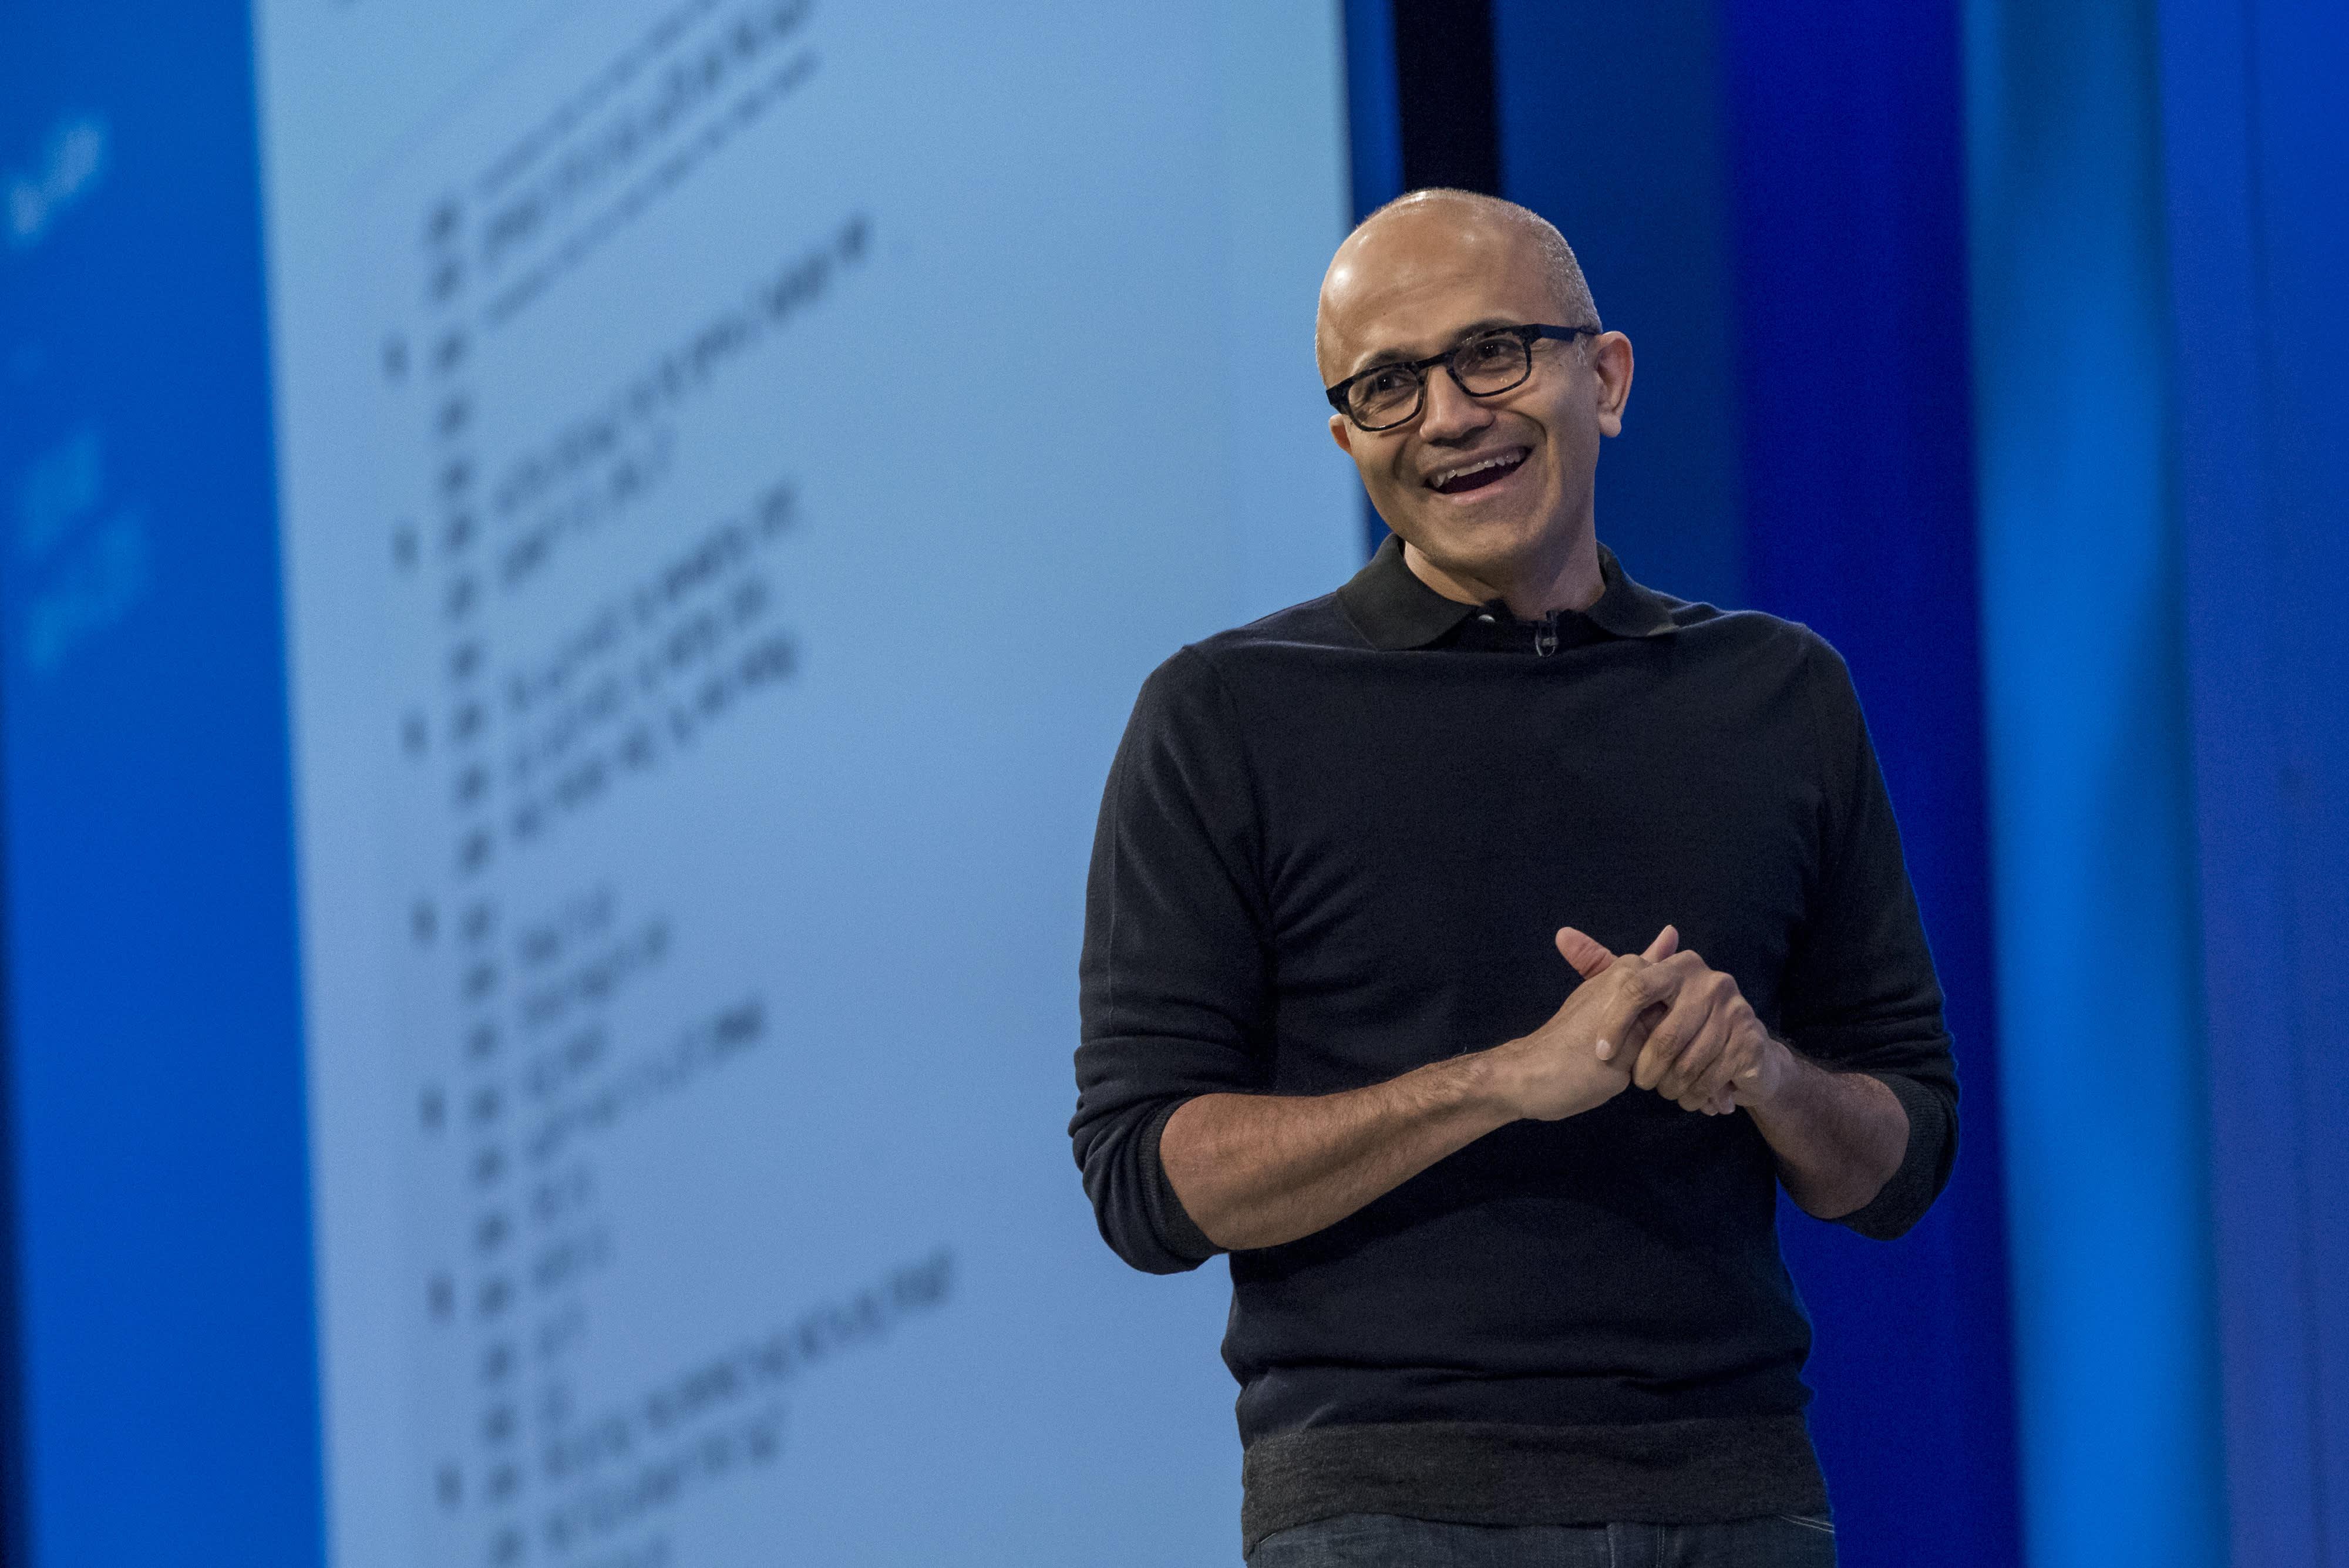 Microsoft CEO Satya Nadella teases big Windows update at Build – CNBC